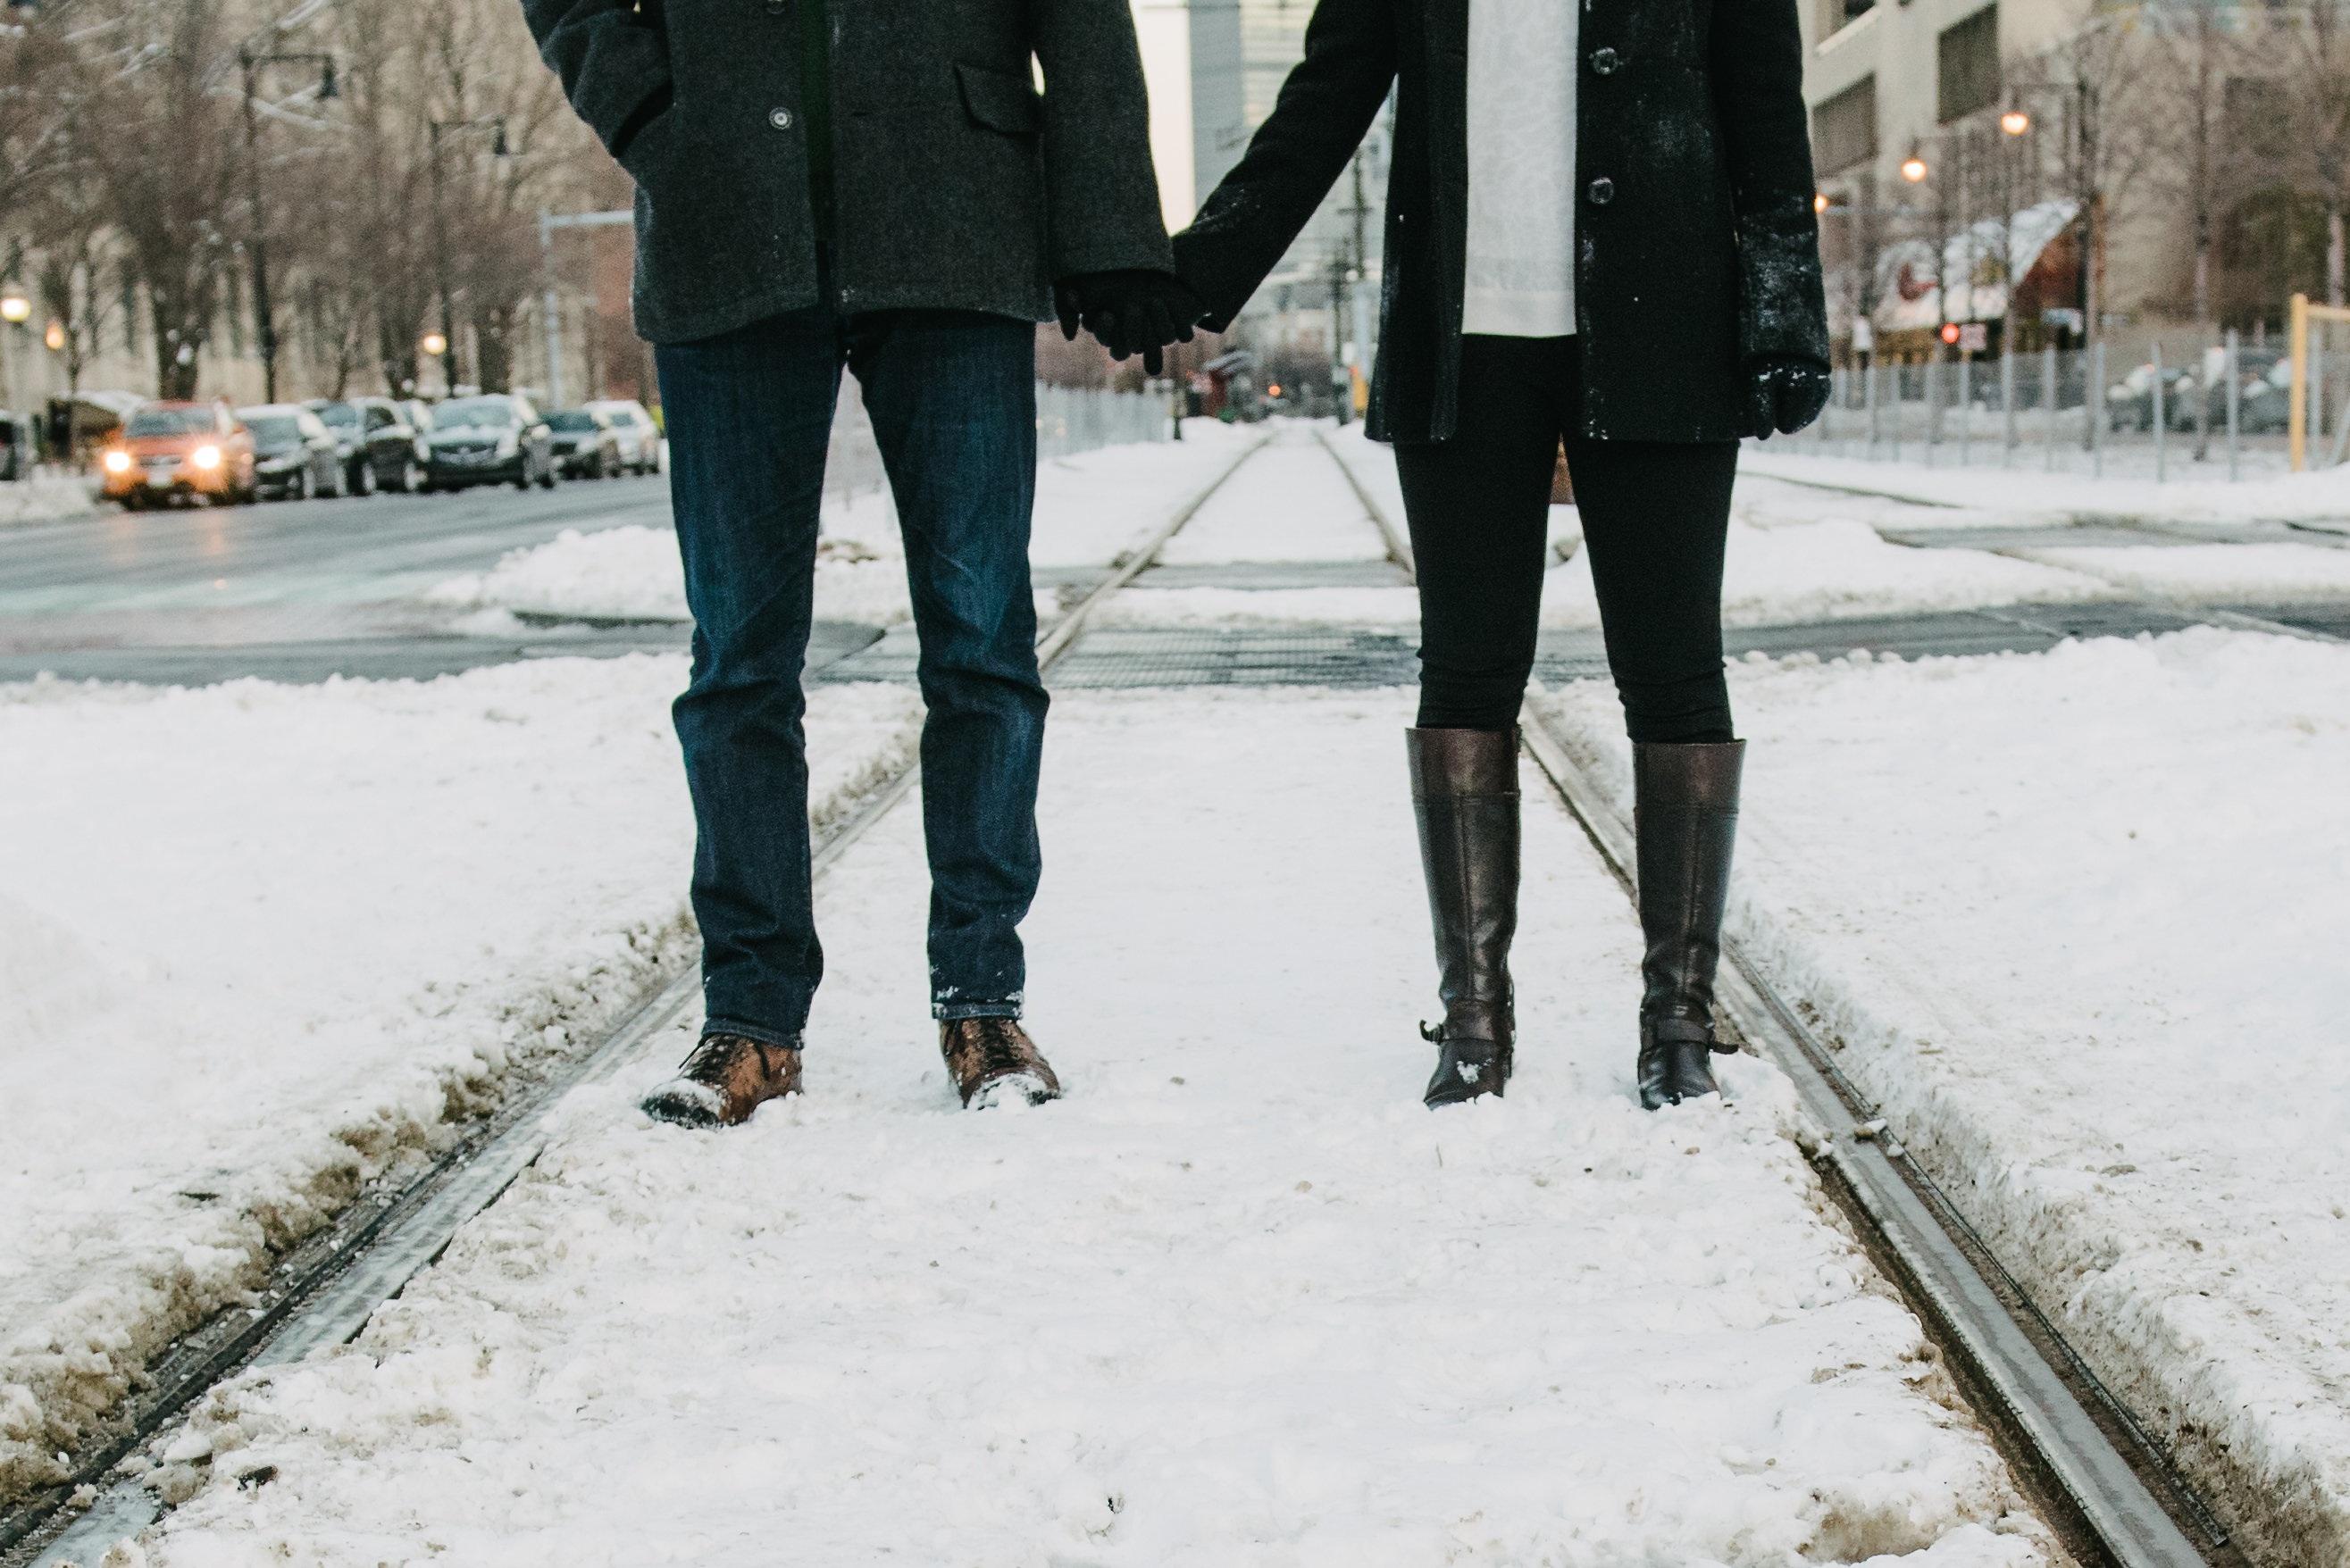 картинки держаться за руки зимой евстифеева ищут, ему